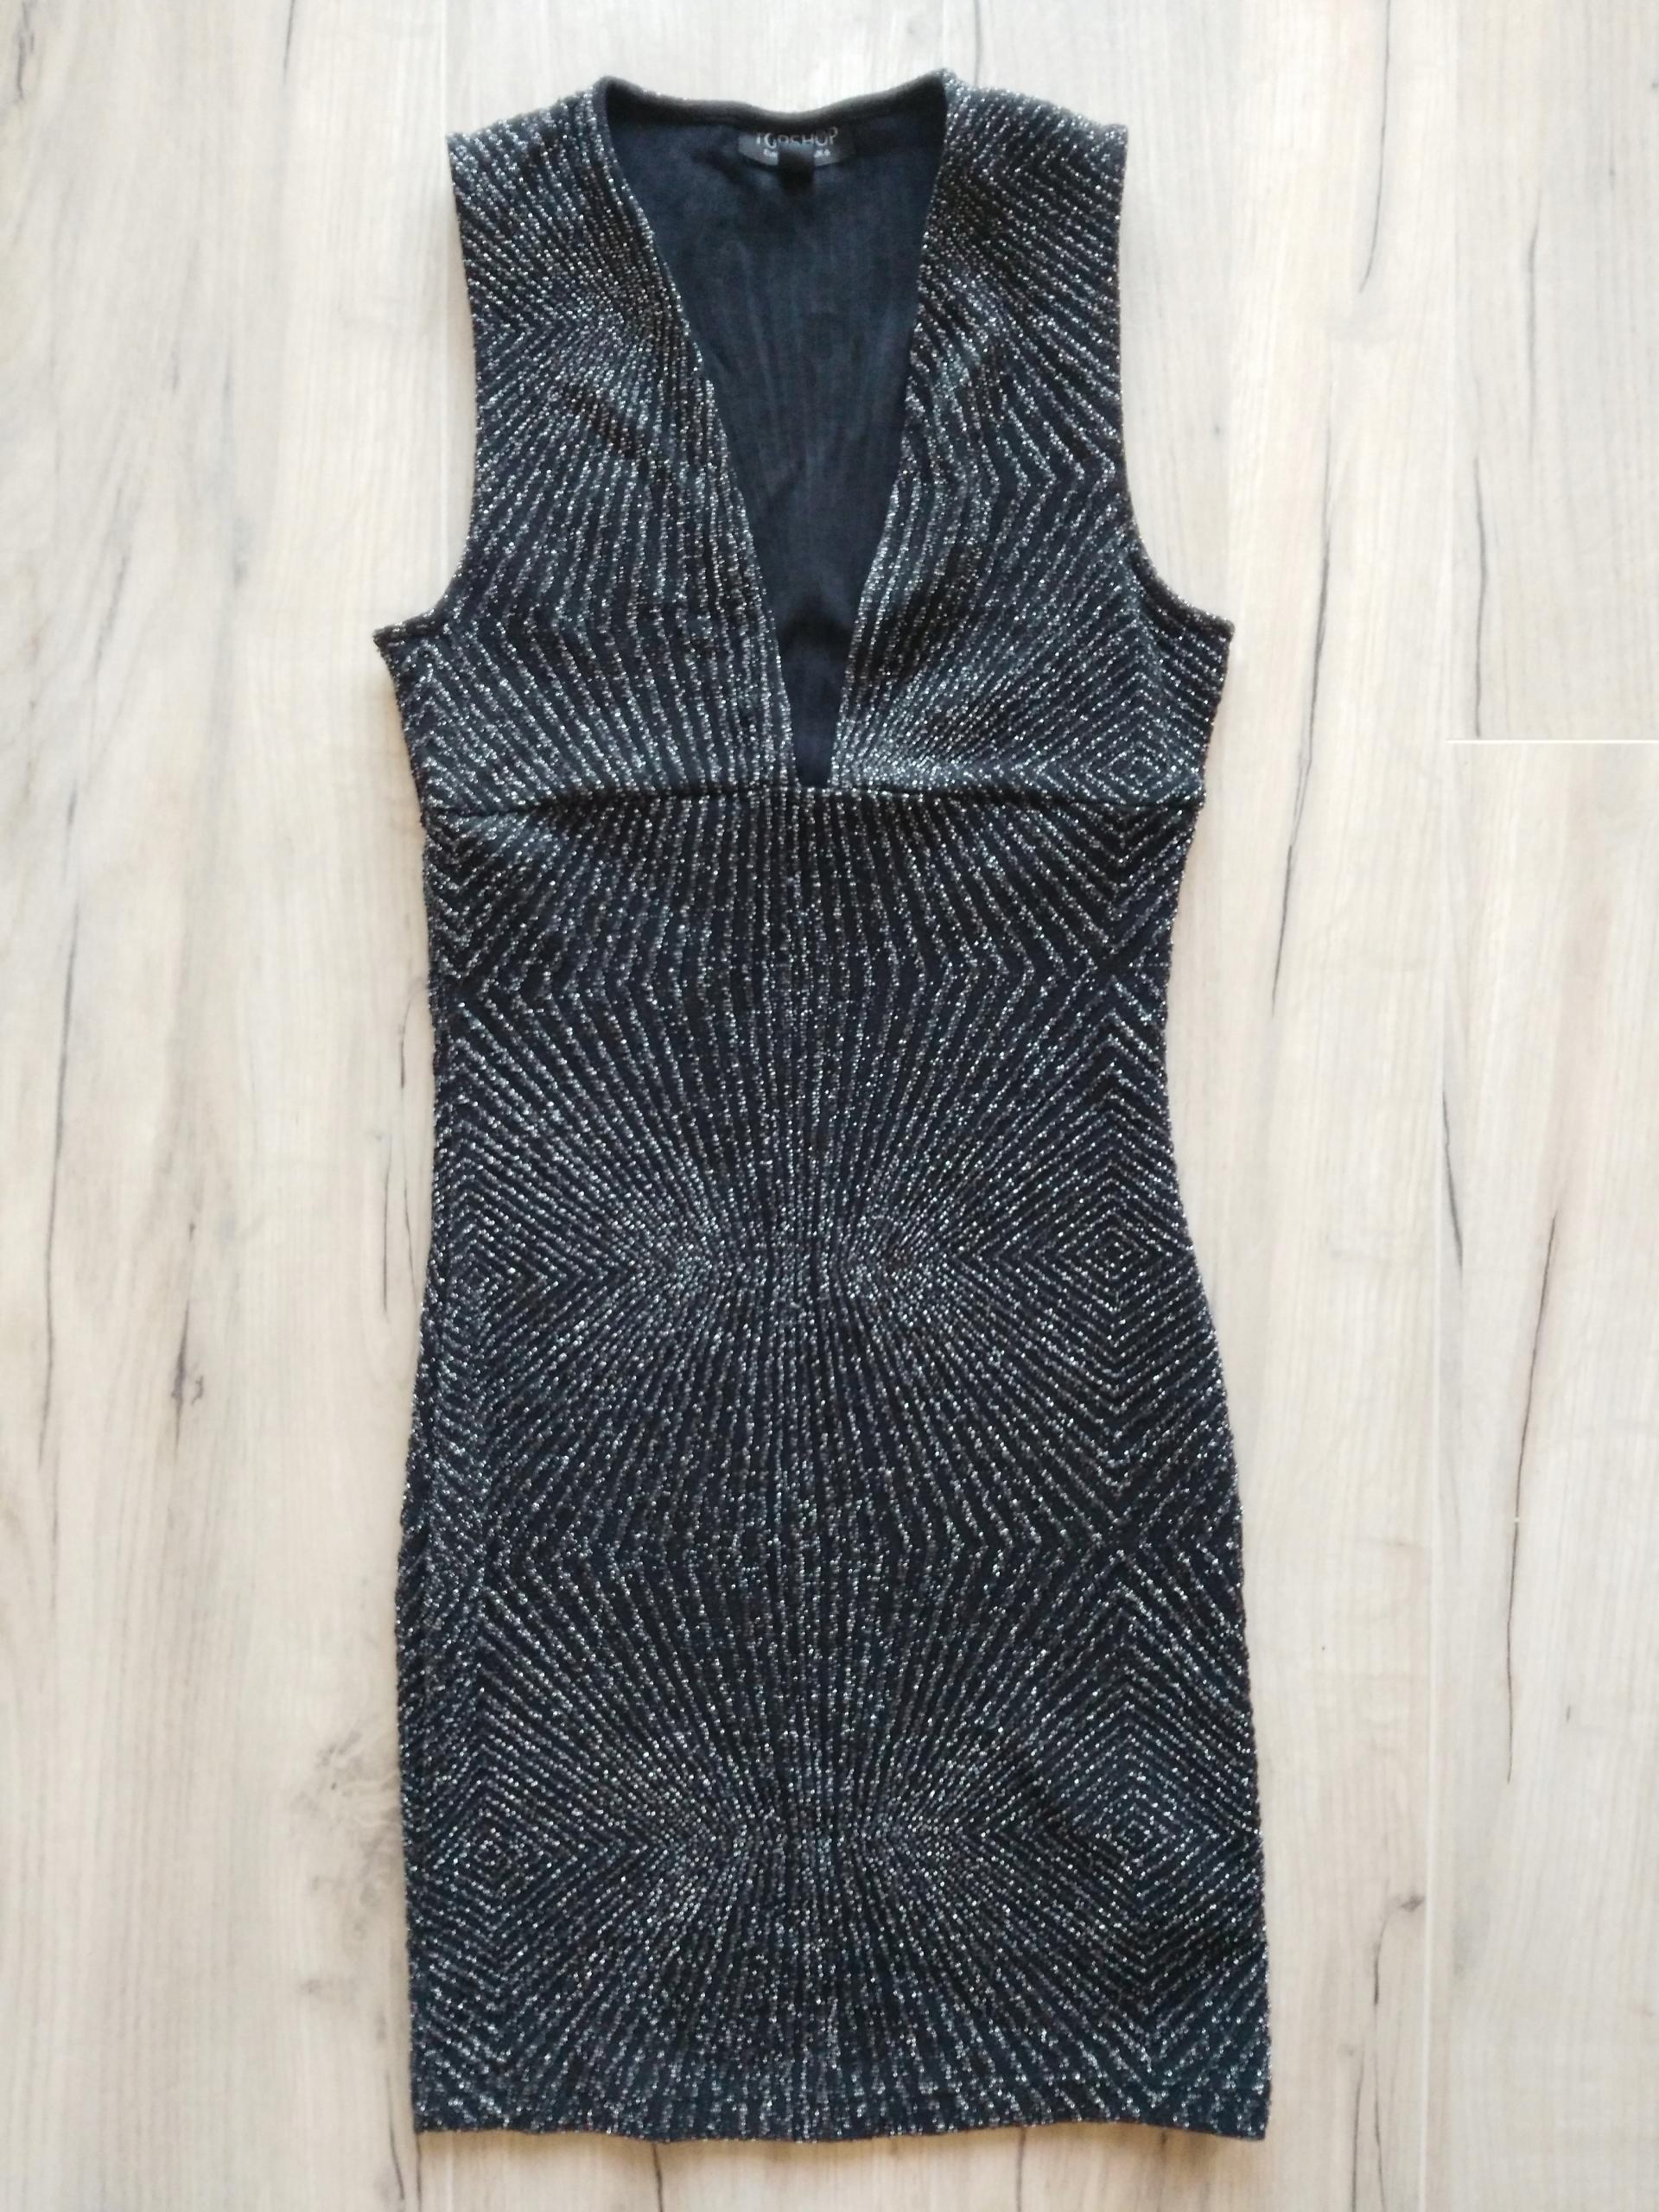 TOP SHOP sukienka, mini, czarna r. XS 34